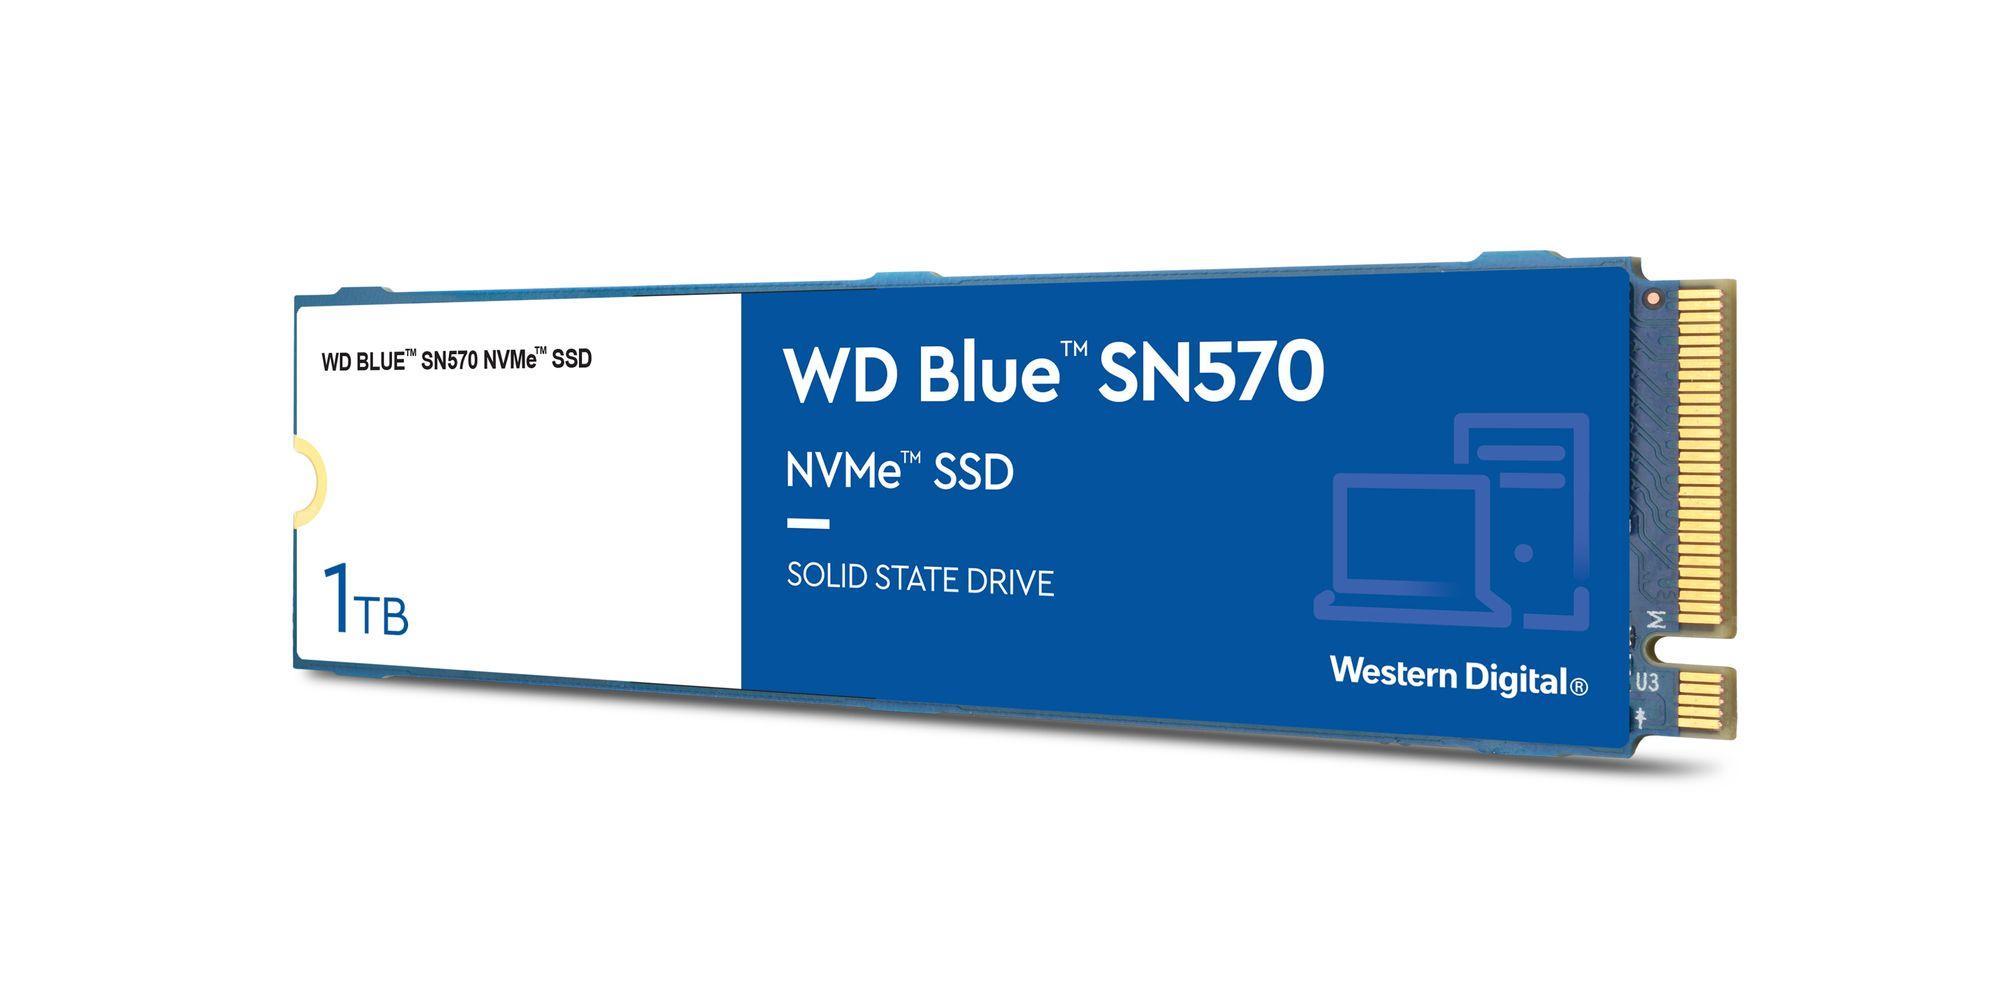 Dysk SSDWD Blue SN570 NVMe SSD, 1TB